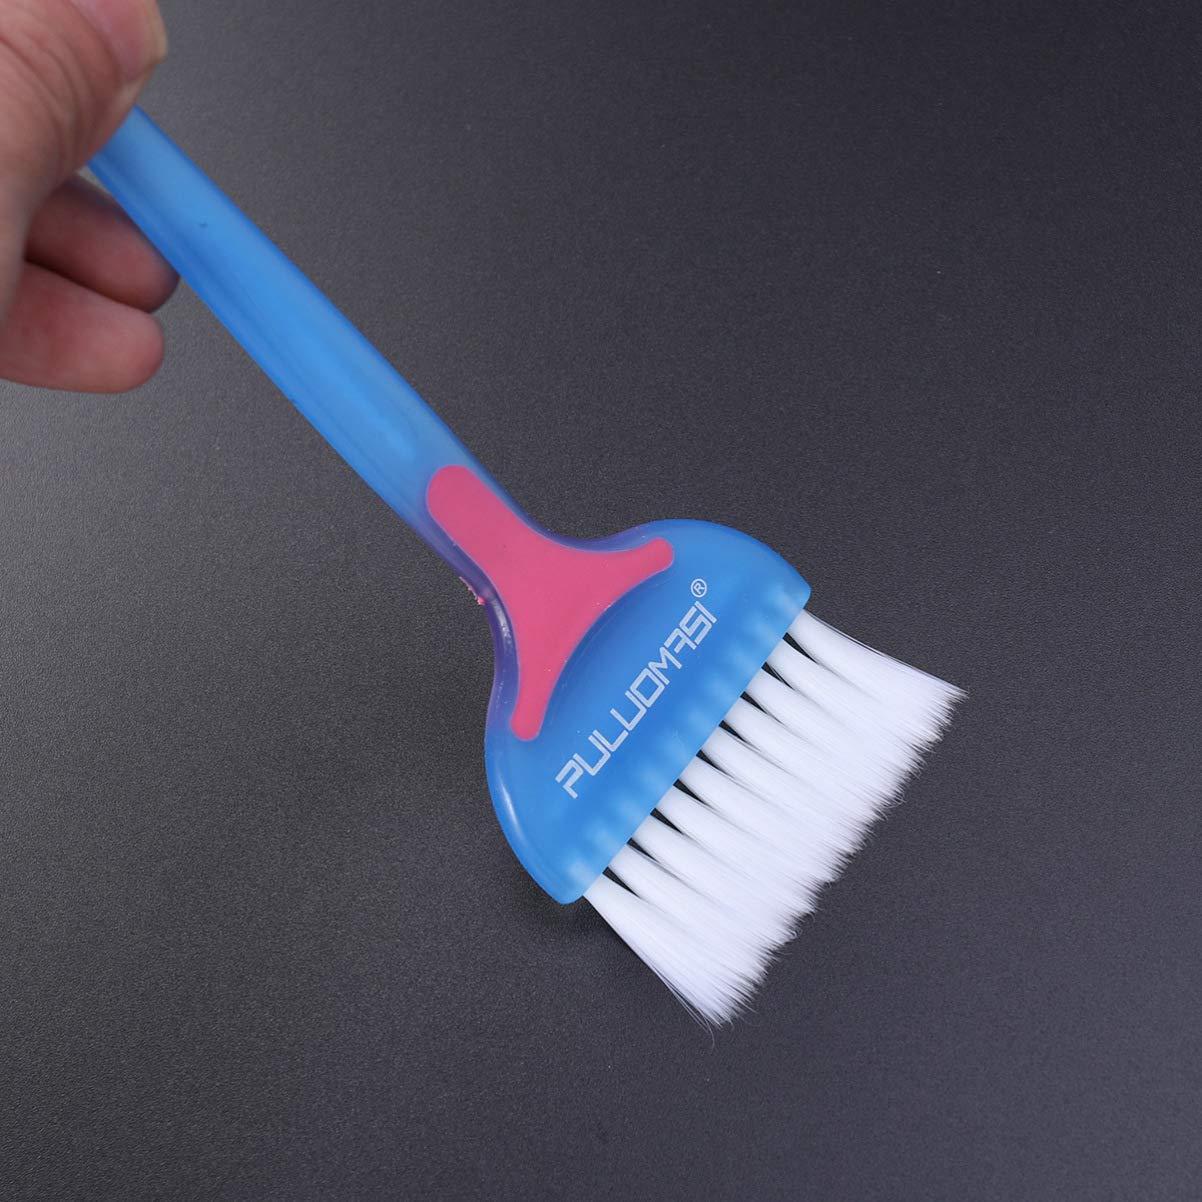 Hair Color Comb Hair dye Brush Hair Color Brush Balayage Brush For Hair Tint Dying Coloring Applicator, 2 Pcs